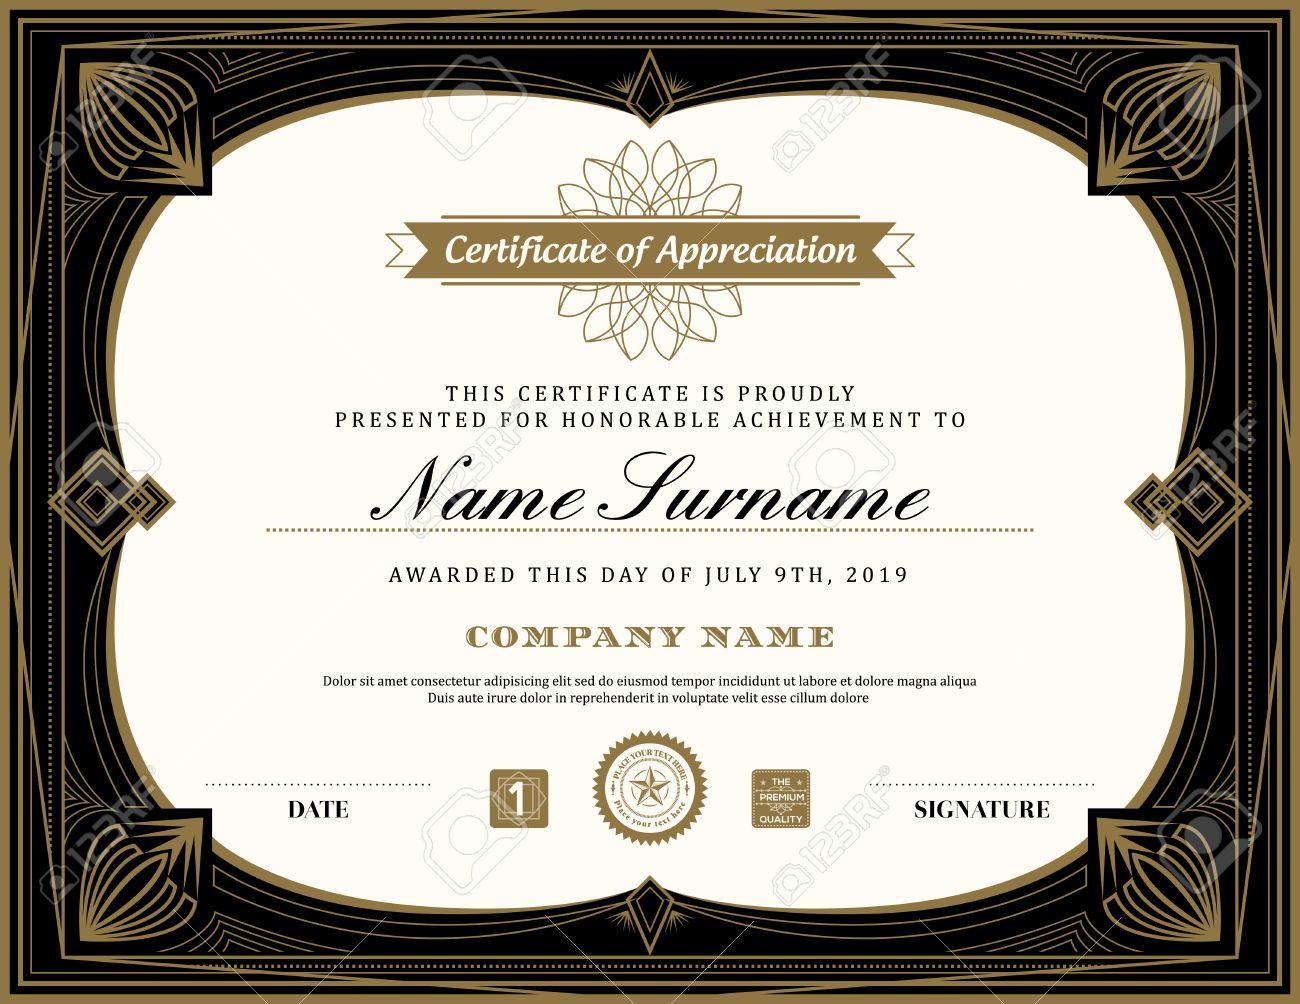 Vintage retro art deco frame certificate background design vintage retro art deco frame certificate background design template stock vector 50152237 yadclub Gallery